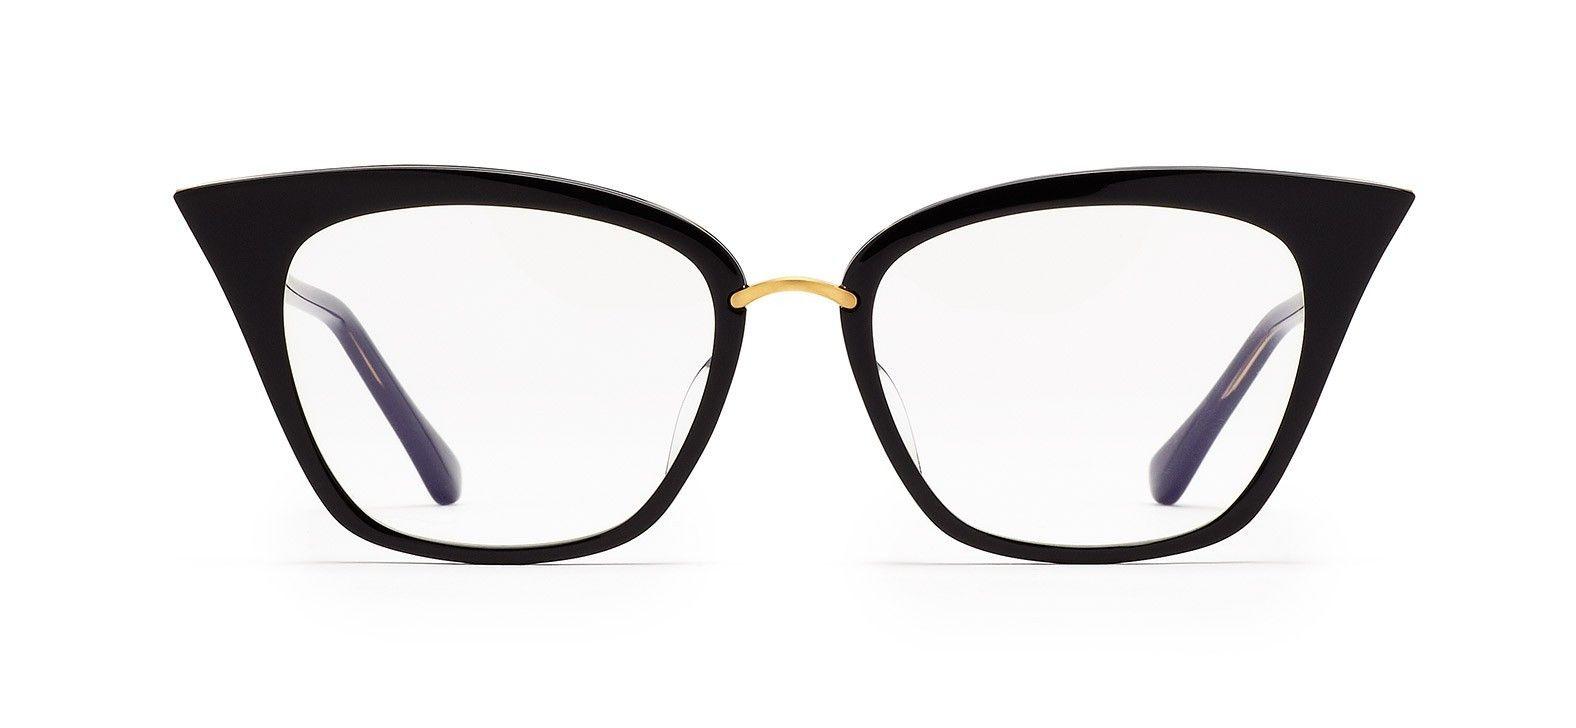 b7f6606874b8 Rebella optical glasses from DITA.